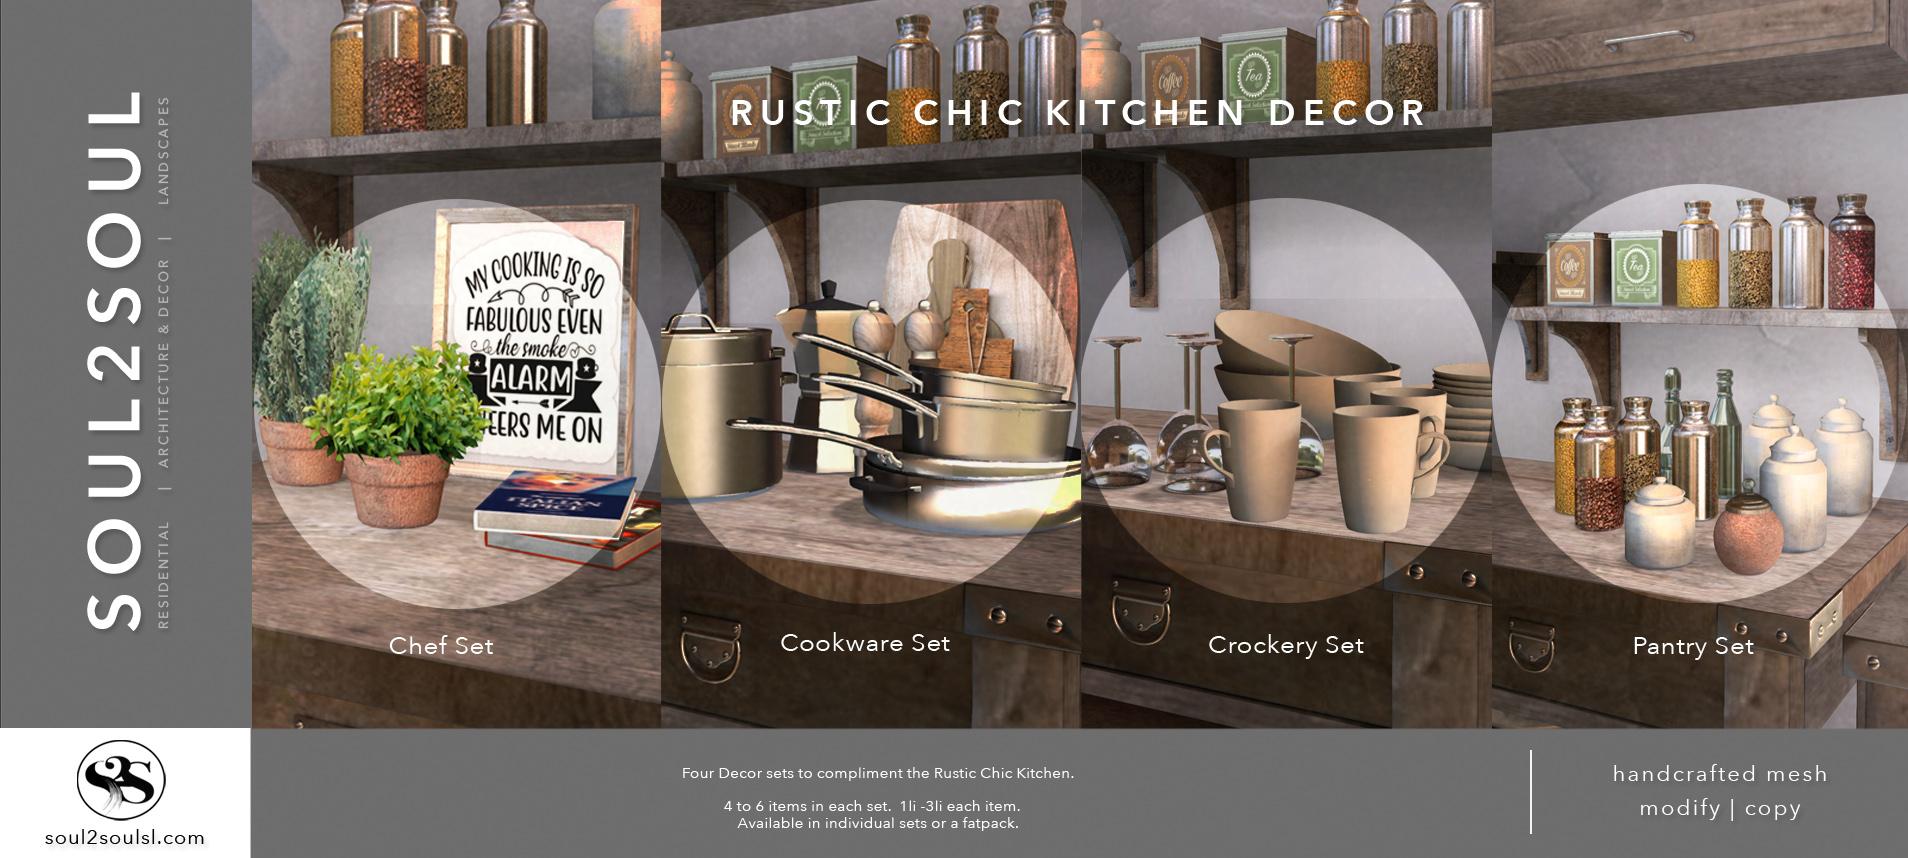 Rustic Chic Kitchen Decor At The Liaison Collaborative Tlc Event Soul2soul Sl